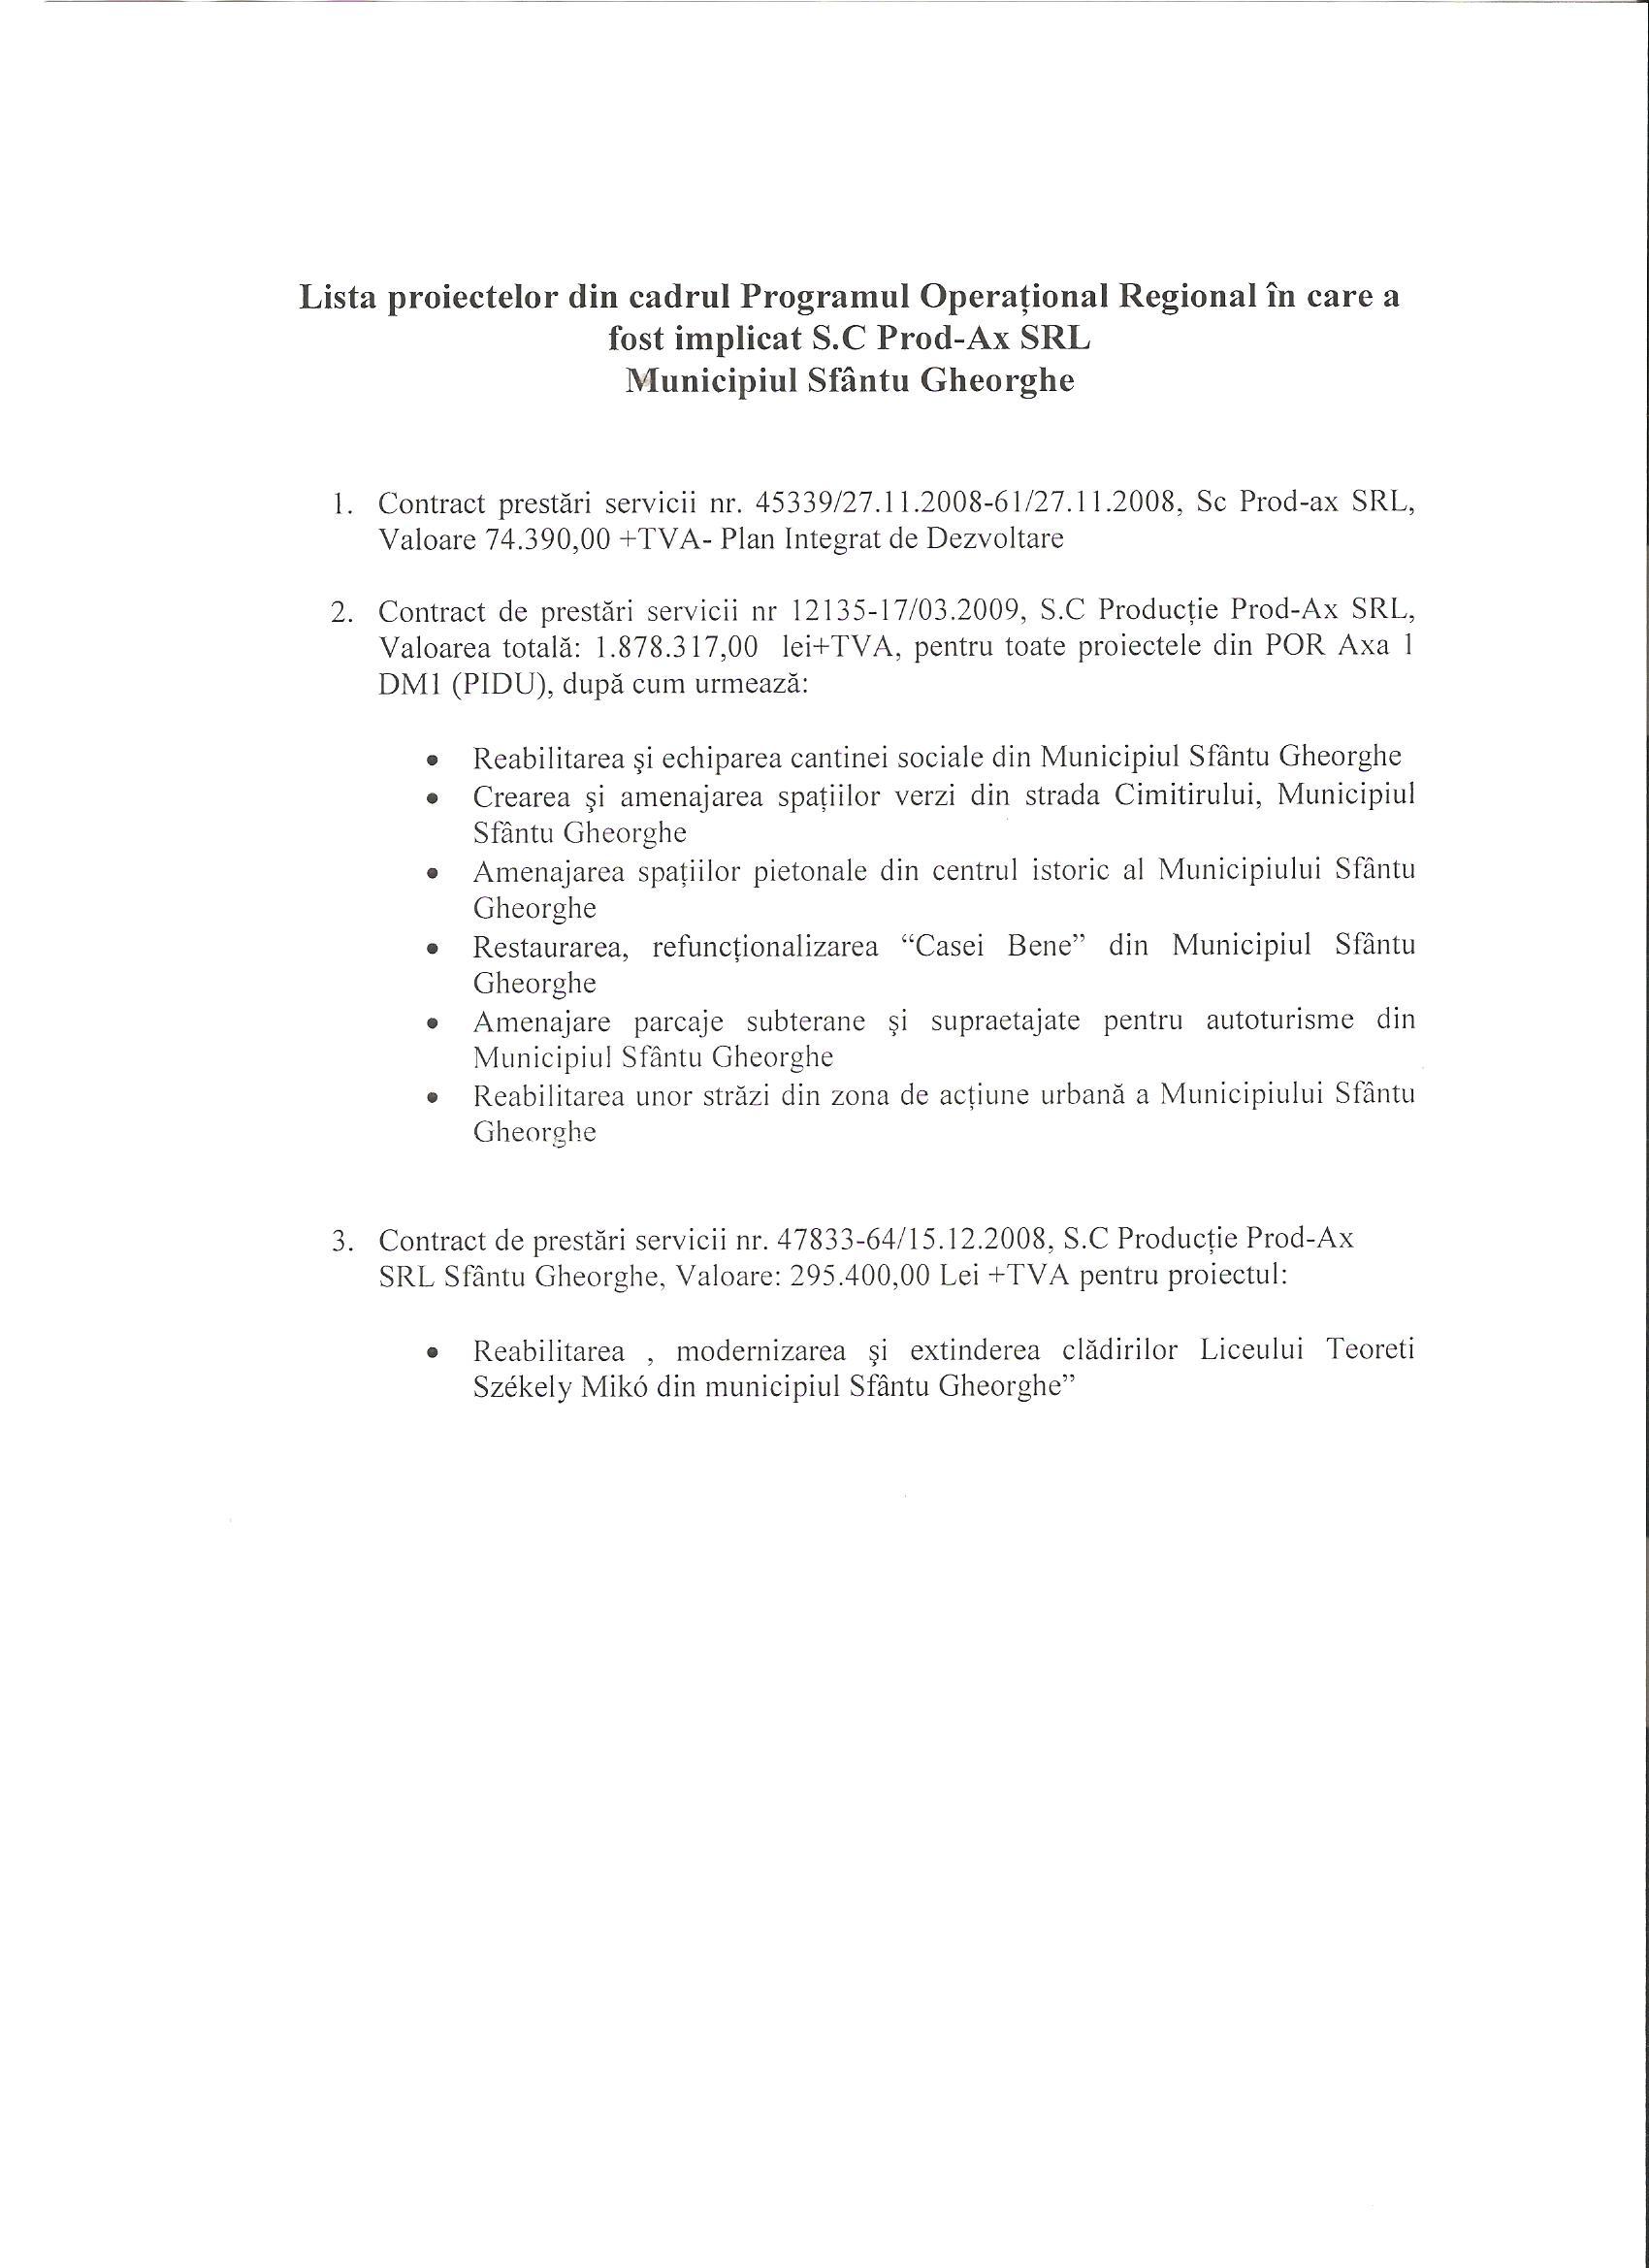 Primăria Sfântu Gheorghe SC Producție Prod AX SRL fonduri europene 2